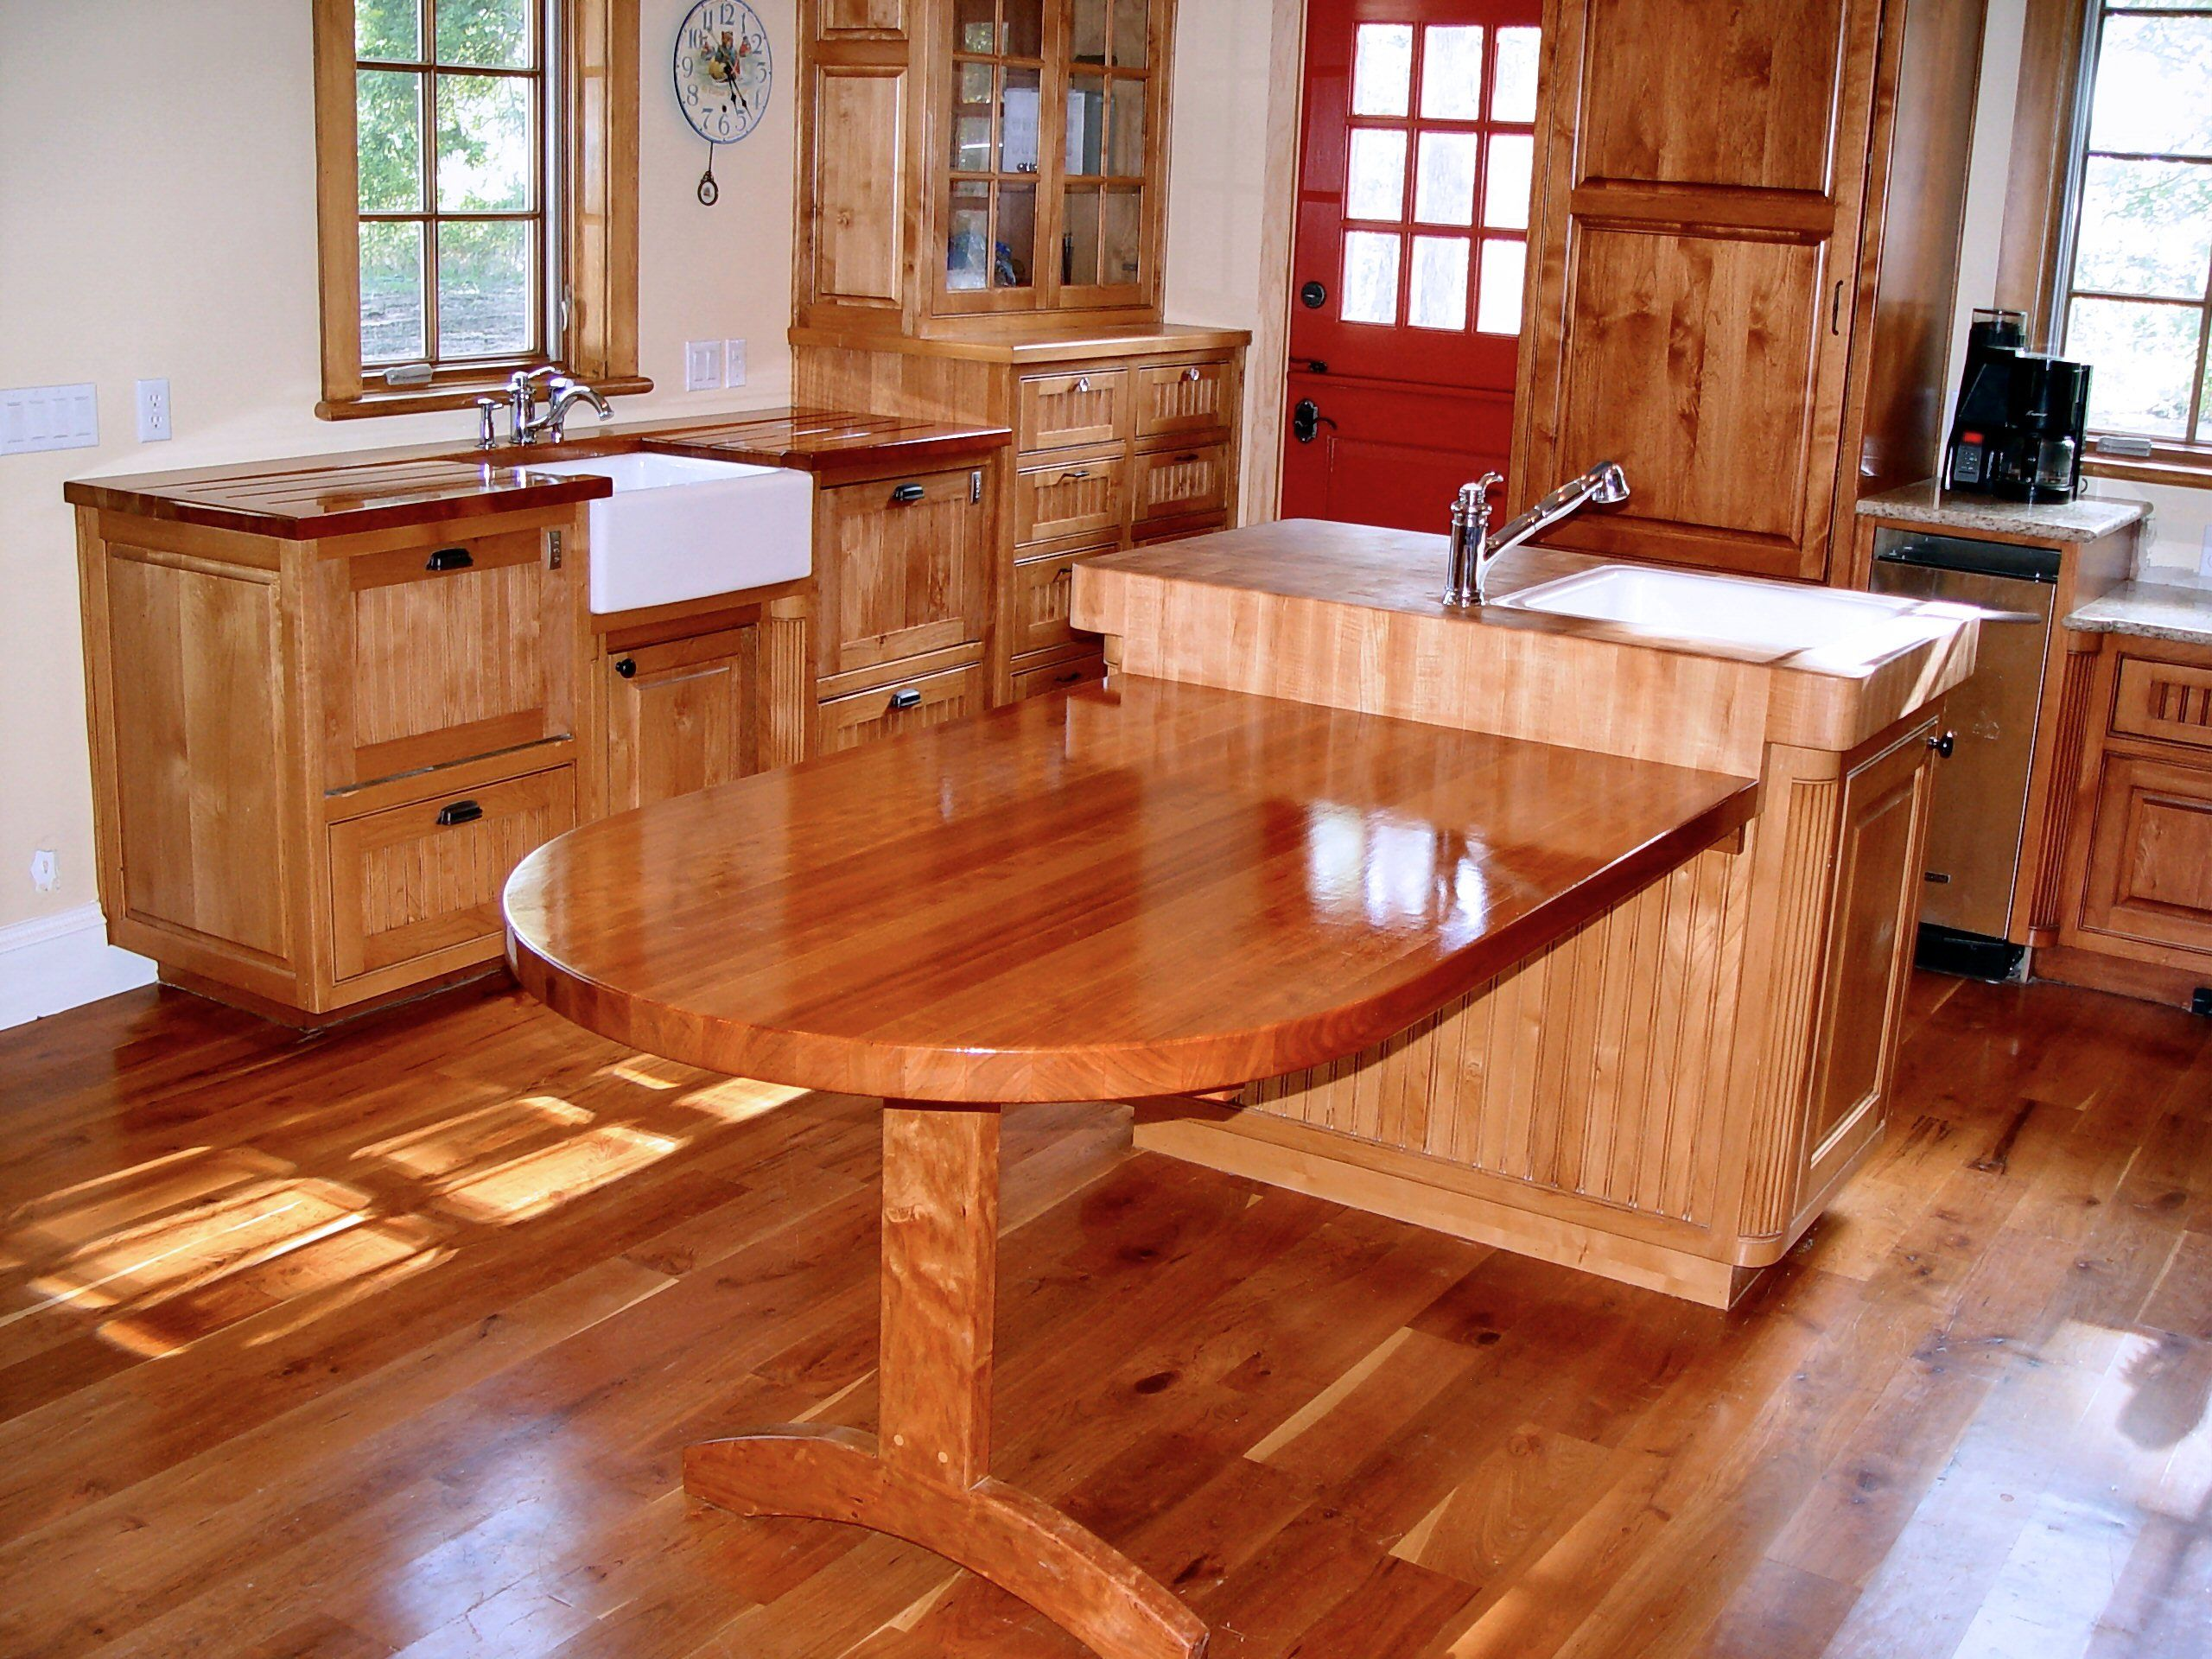 Cherry Wood Countertop Photo Gallery By Devos Custom